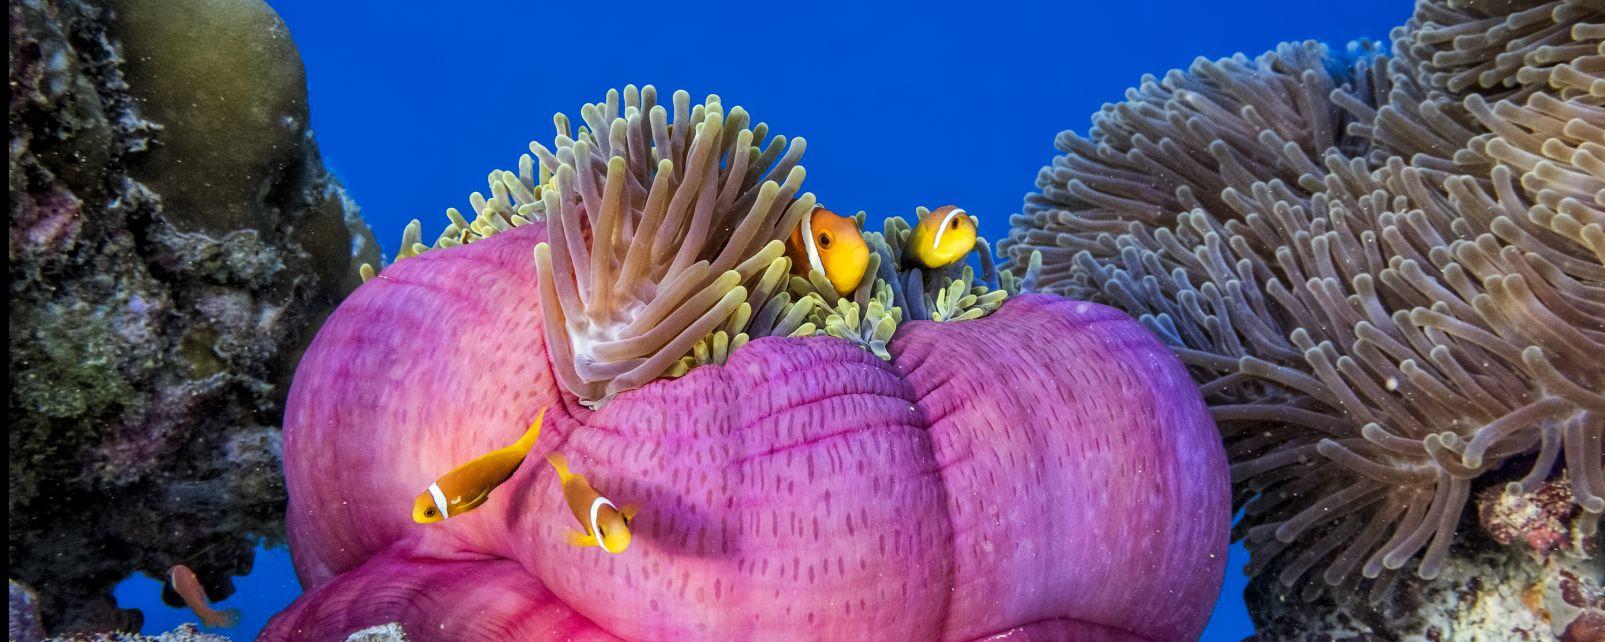 Marine Wildlife The Maldives Maldive Islands